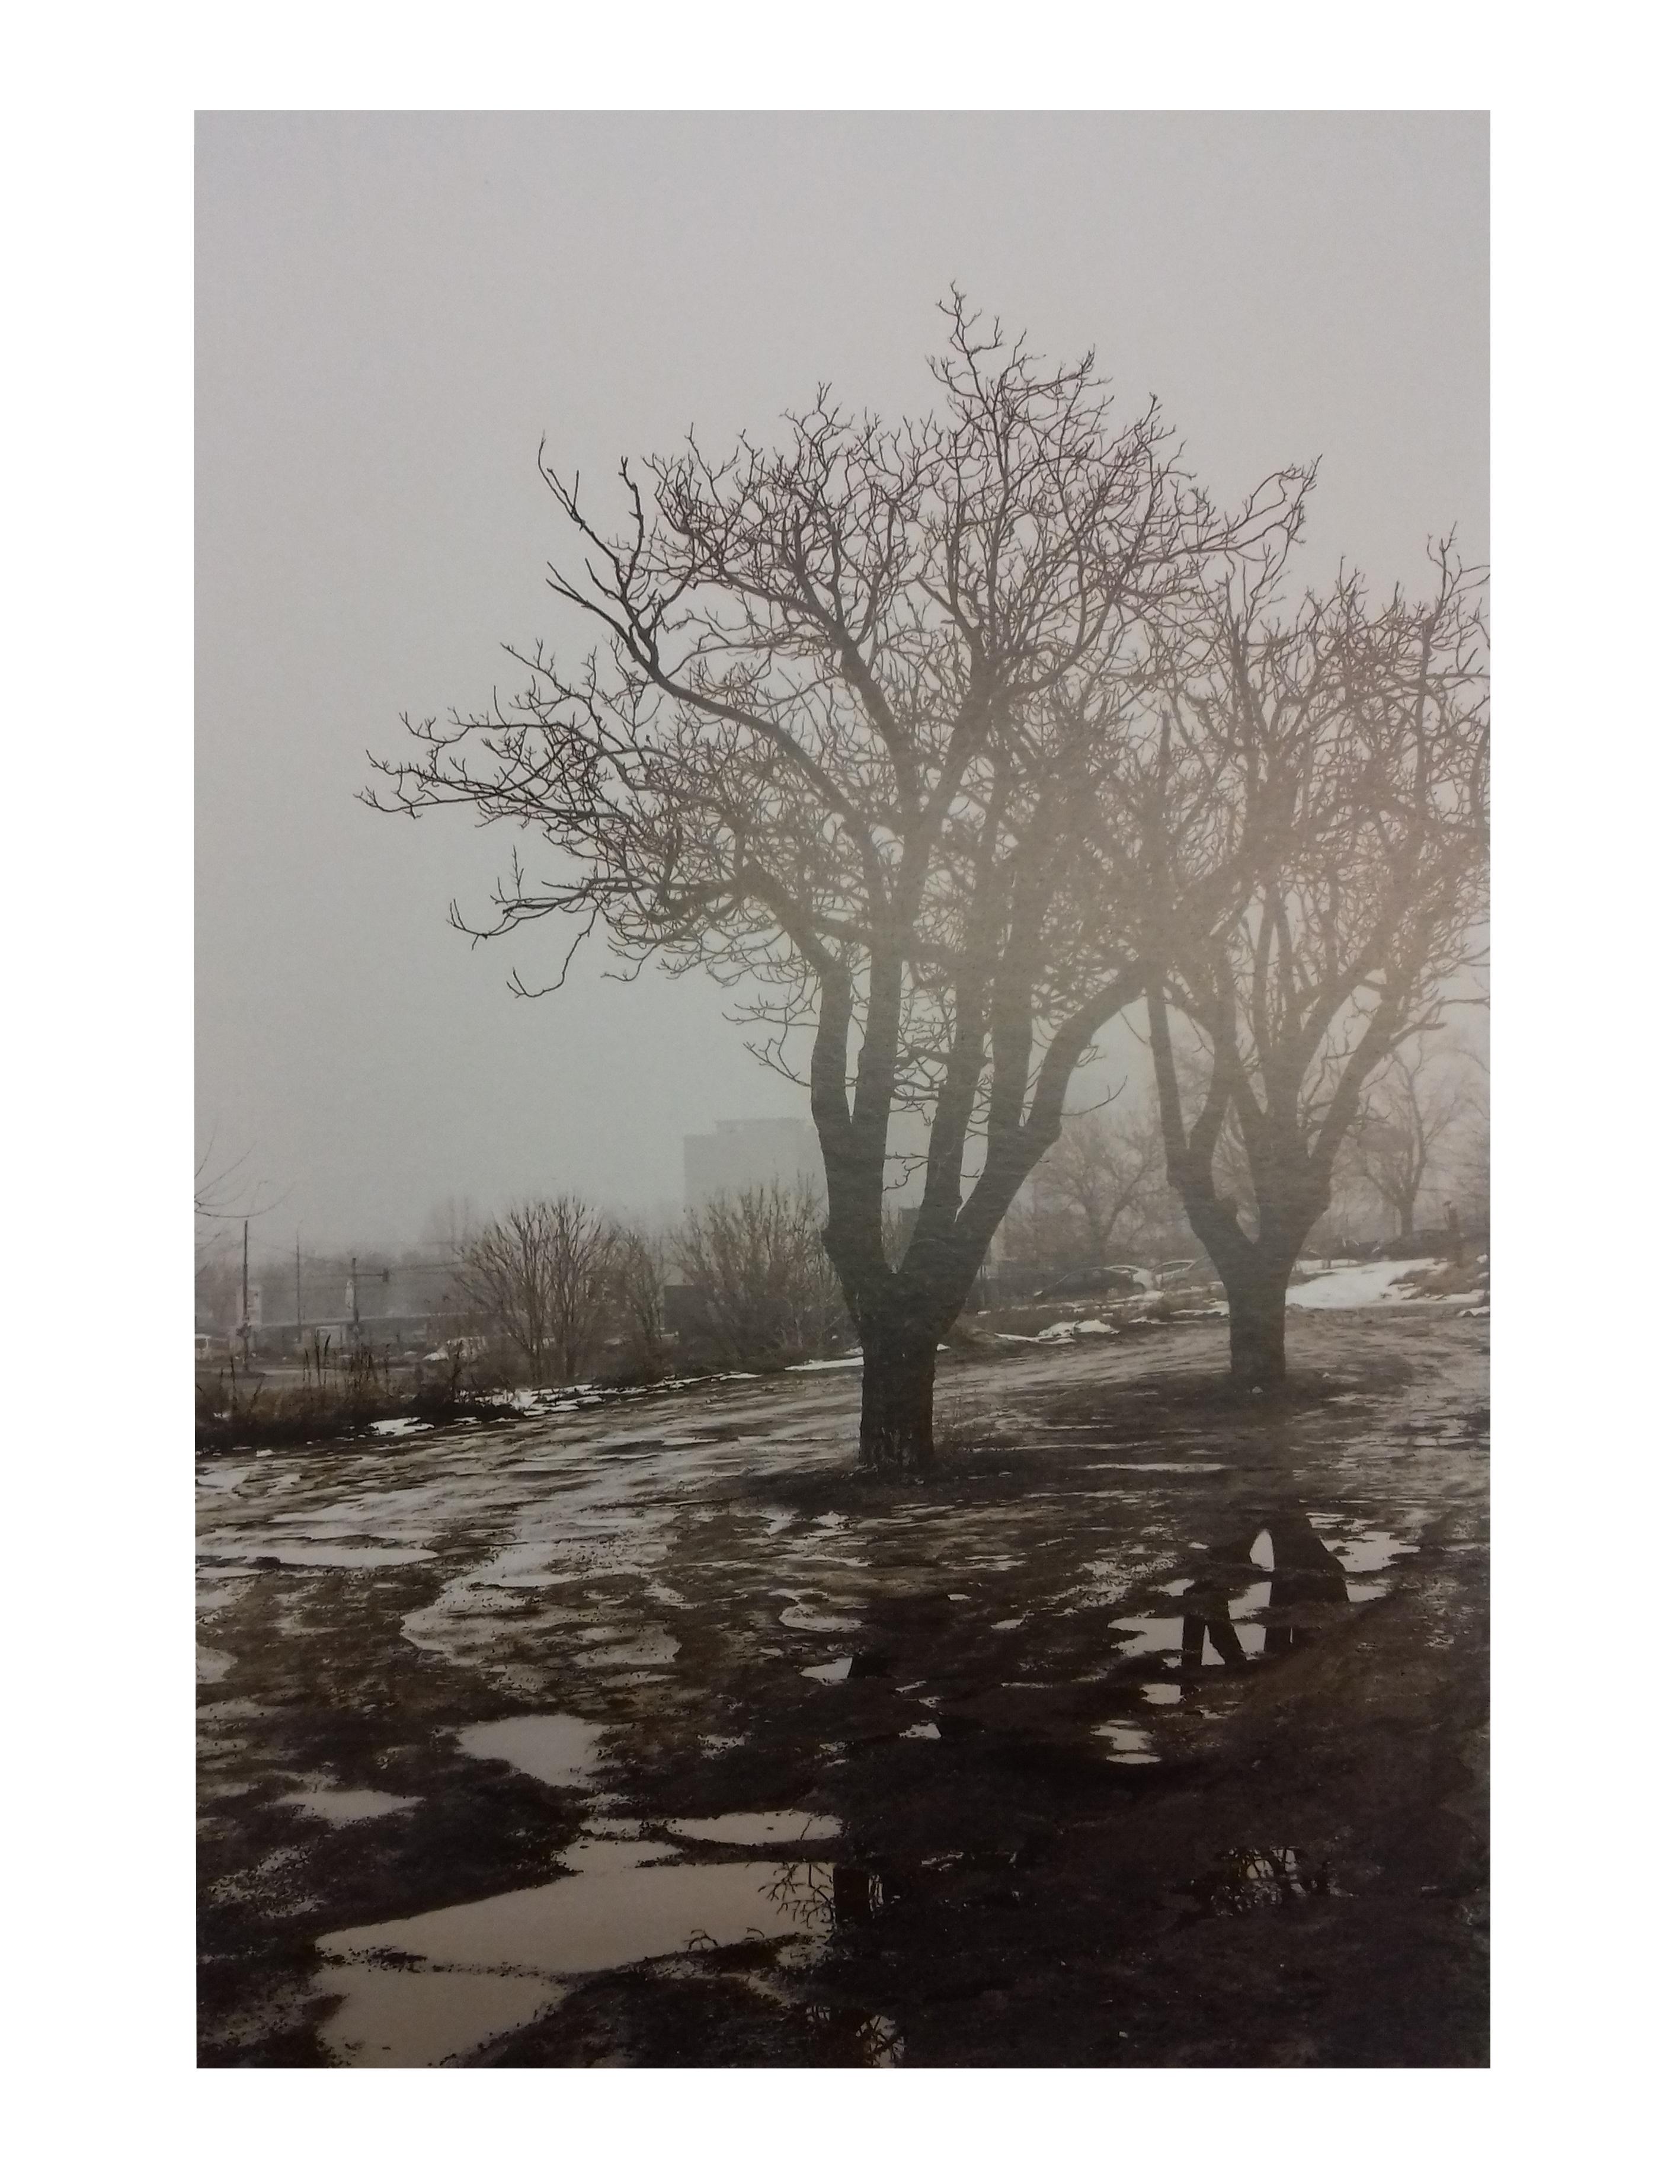 Album de fotografie: Sieranevada